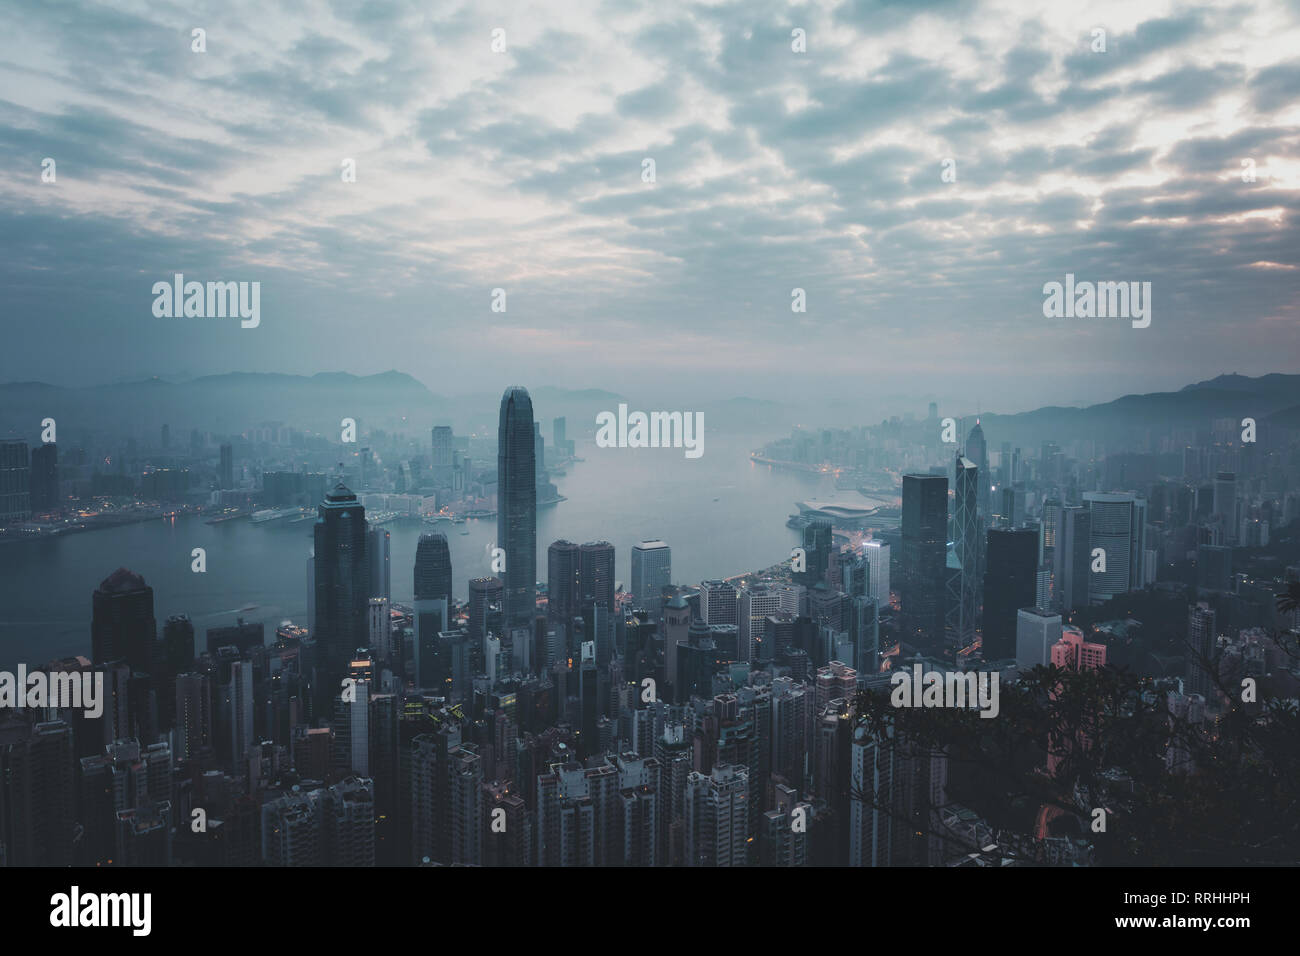 Foschia mattutina in vista della città di Hong Kong. vista dal Victoria Peak Foto Stock